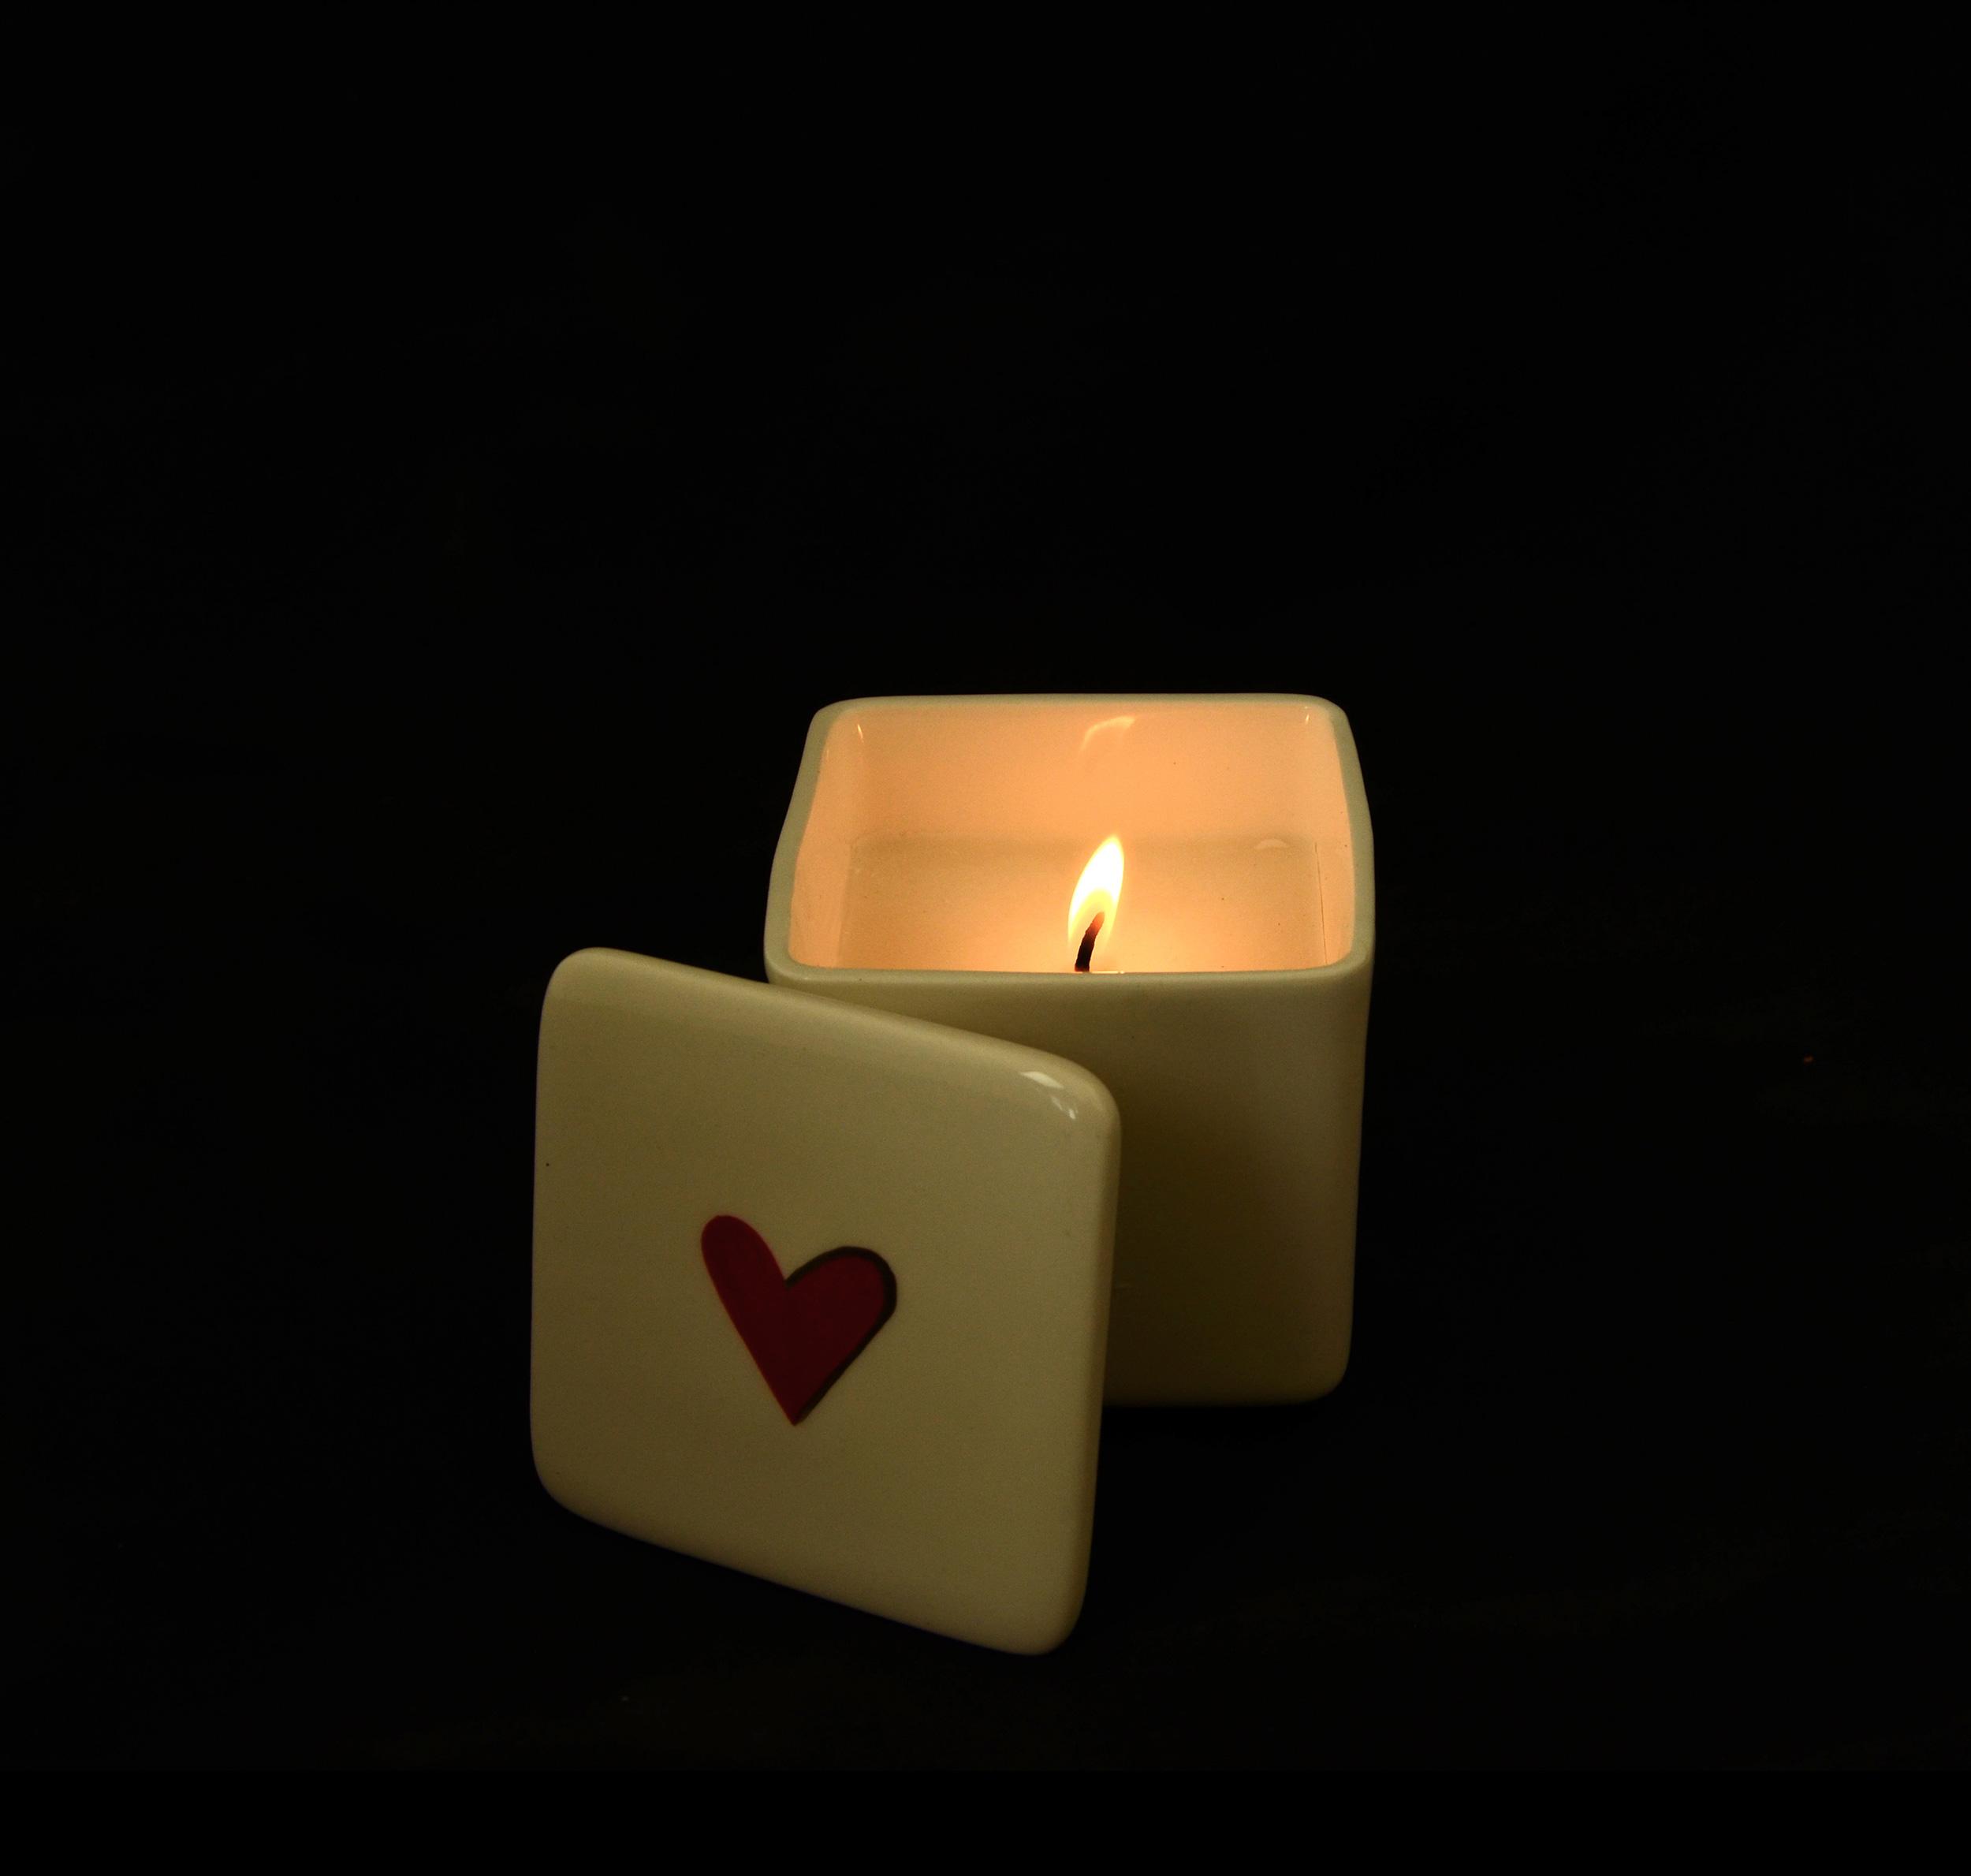 kapula-handmade-filled-ceramic-candle-heart.jpg